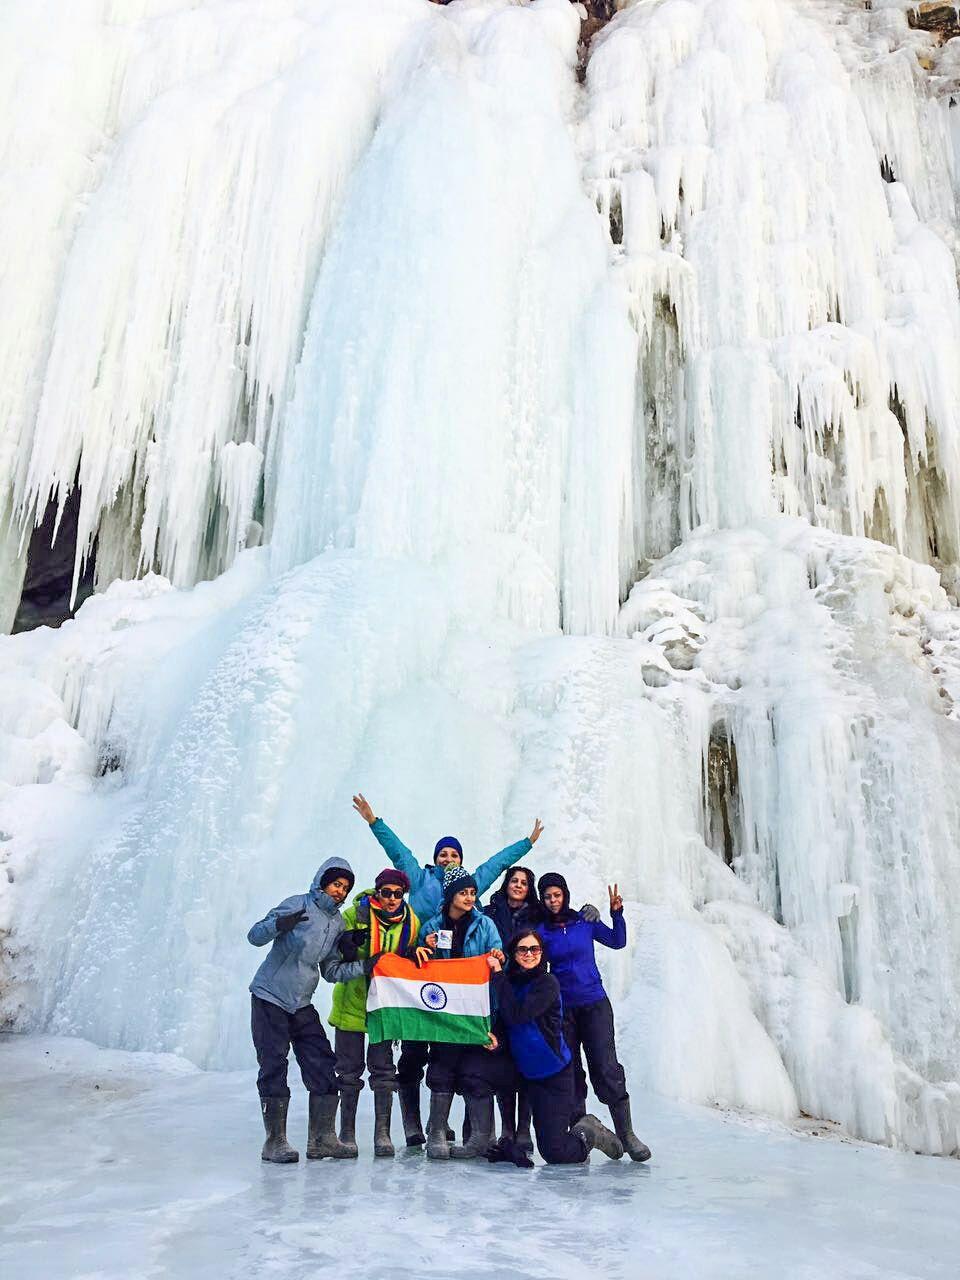 Photo of Chadar trek - Trekking In Ladakh - Frozen River Trekking In Ladakh By Surekha Bhavimani